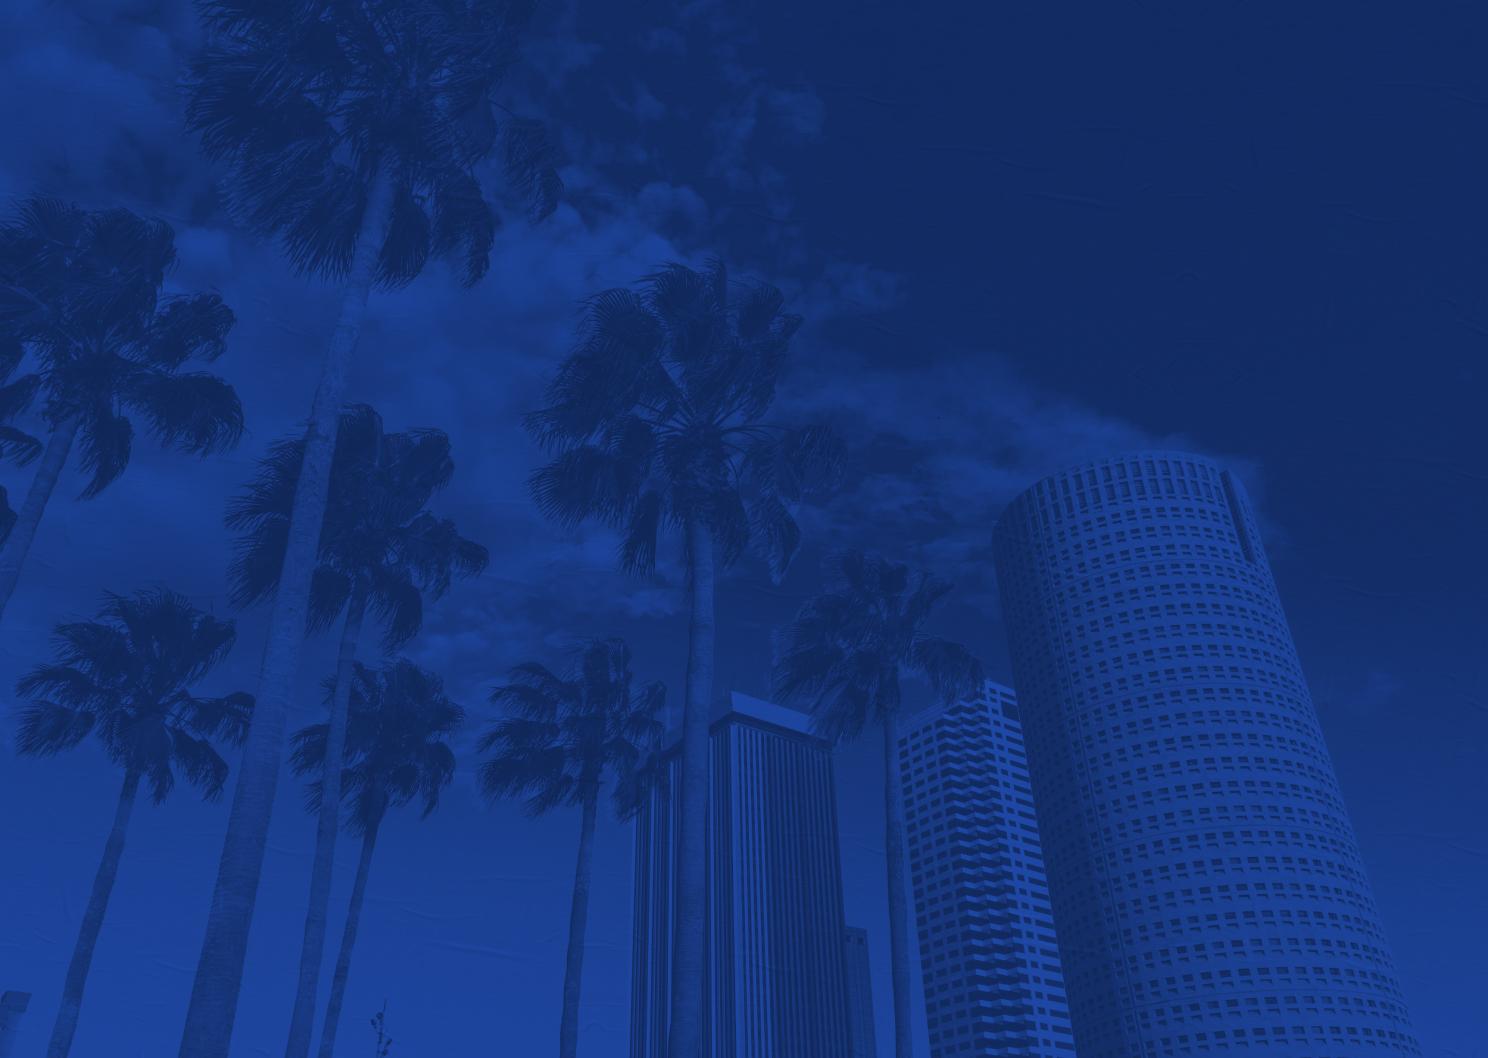 Tampa Bay BG